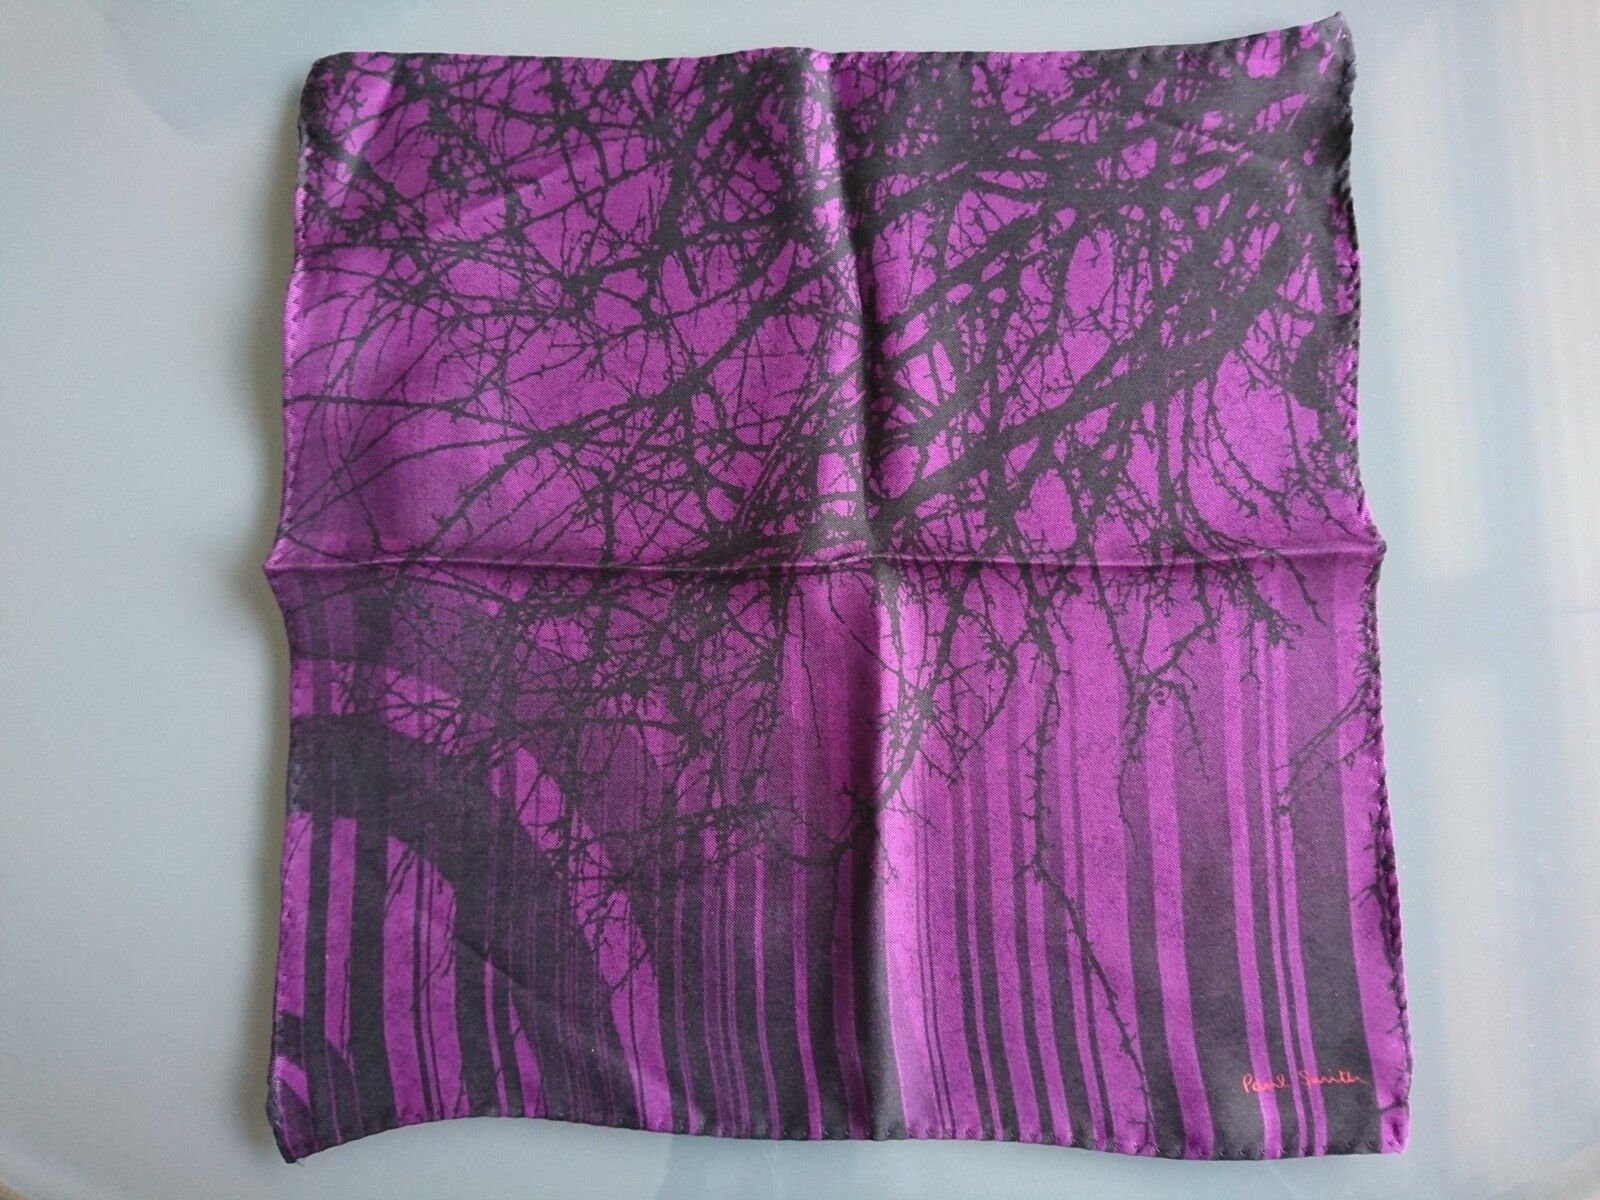 Paul Smith Pocket Square Handkerchief - BNWT 100% Silk 'Black Forest' RRP: